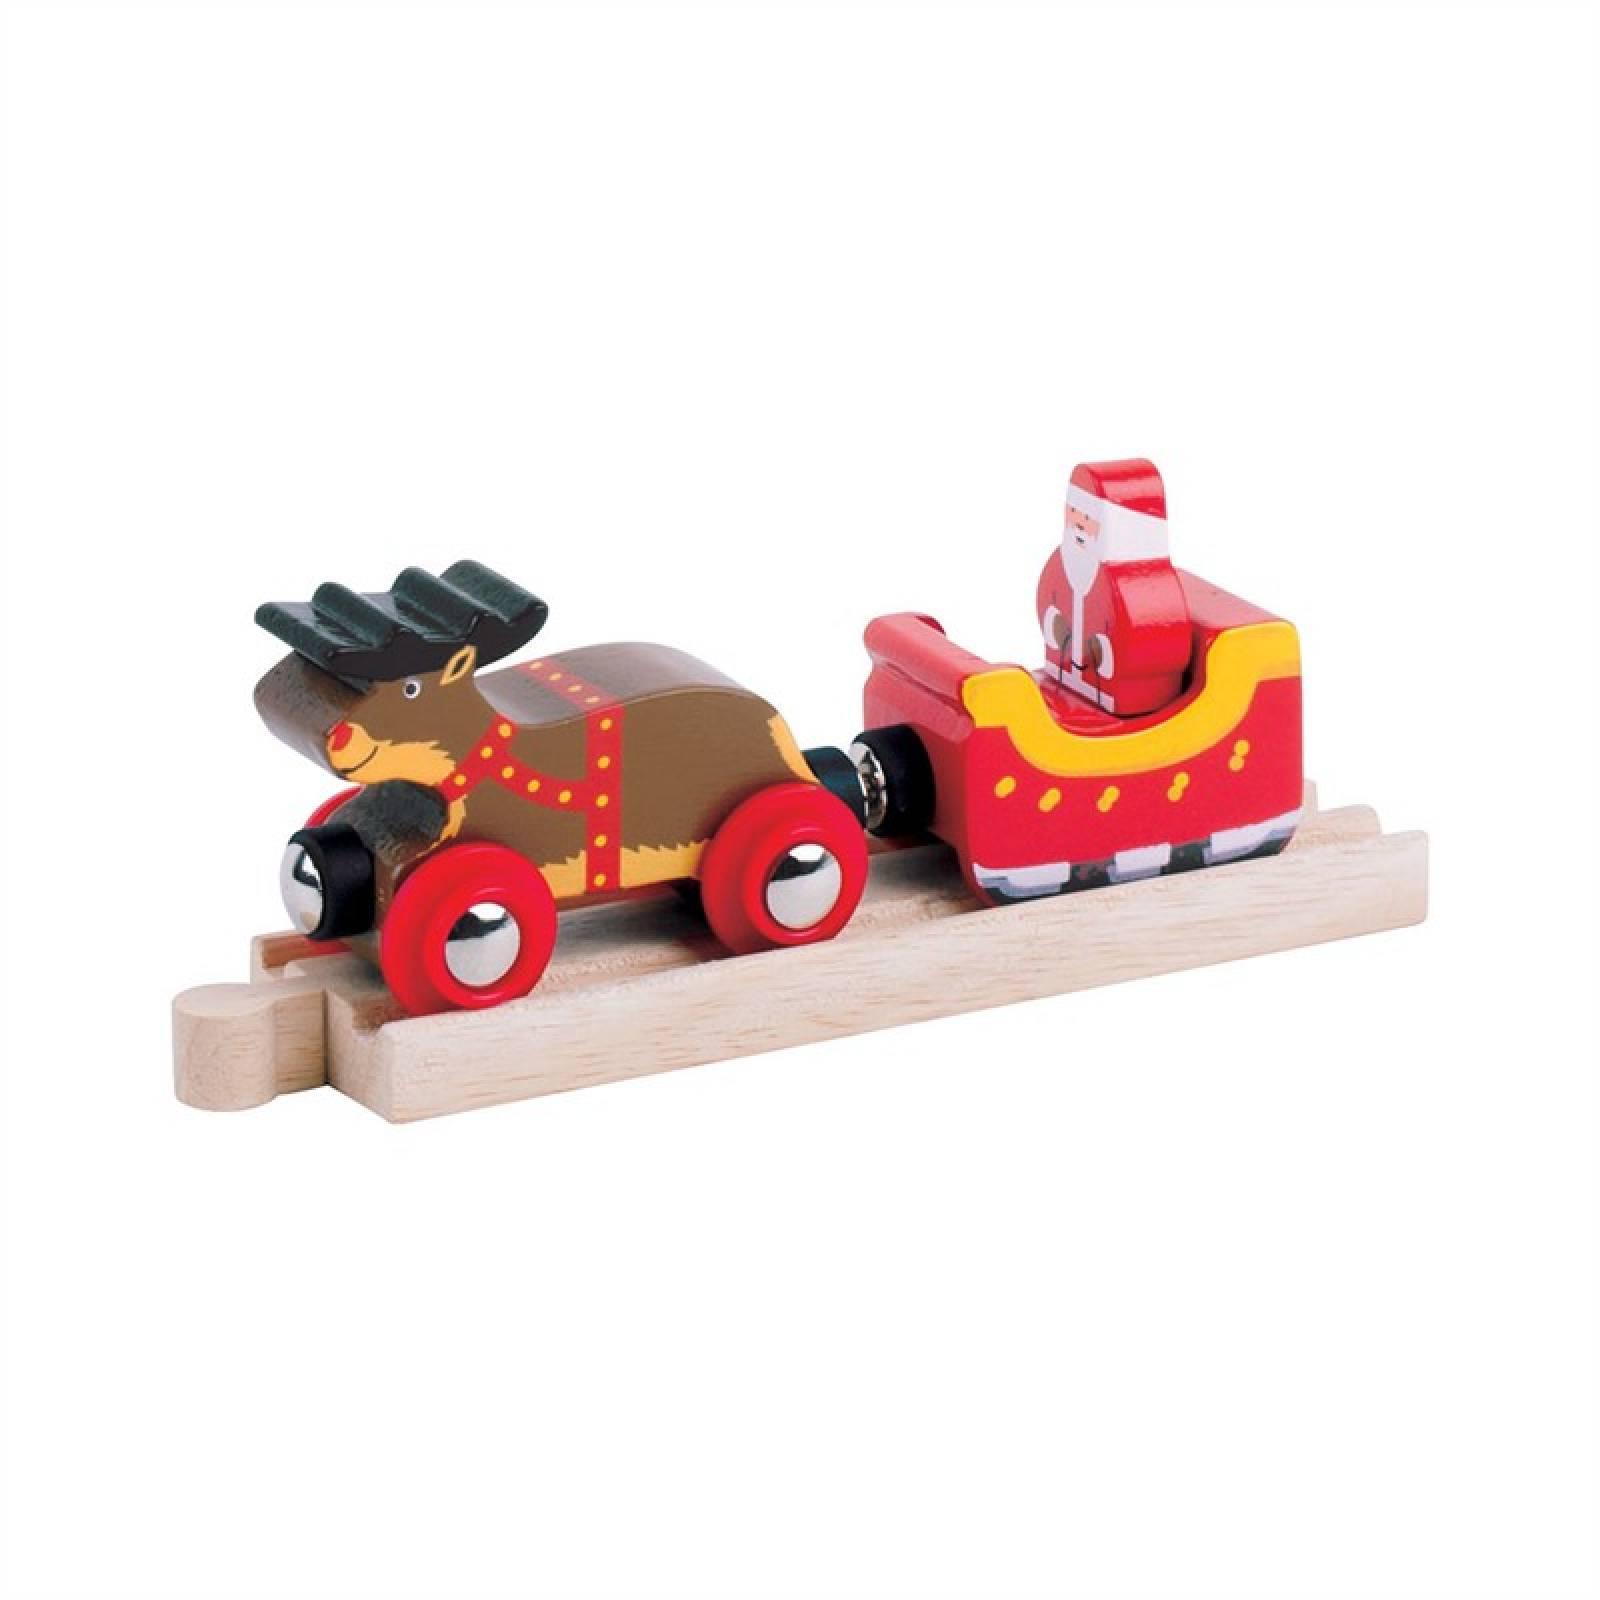 Santa Sleigh & Reindeer Wooden Train Figures & Track